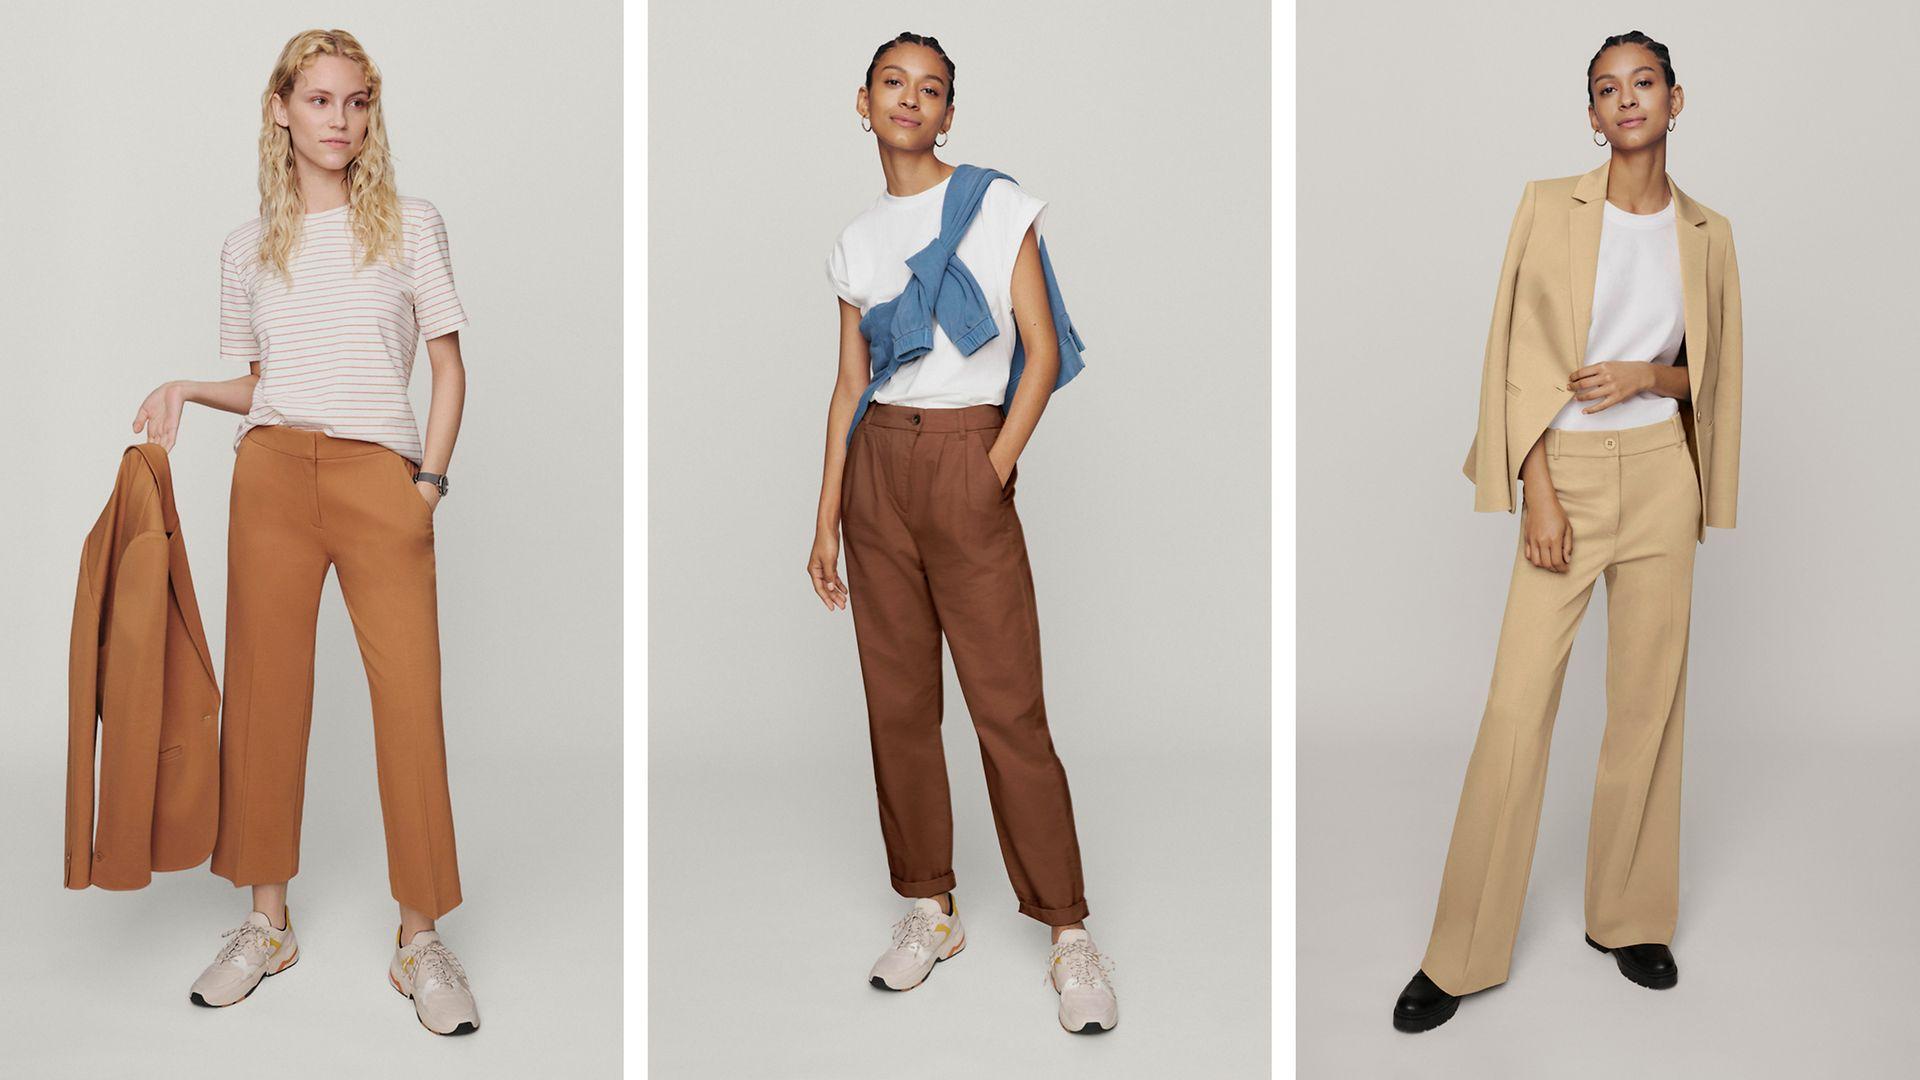 072021 - Women - Inspiration - Lookbook - Pantalons tout simplement idéals - Hero Large 1 IMG